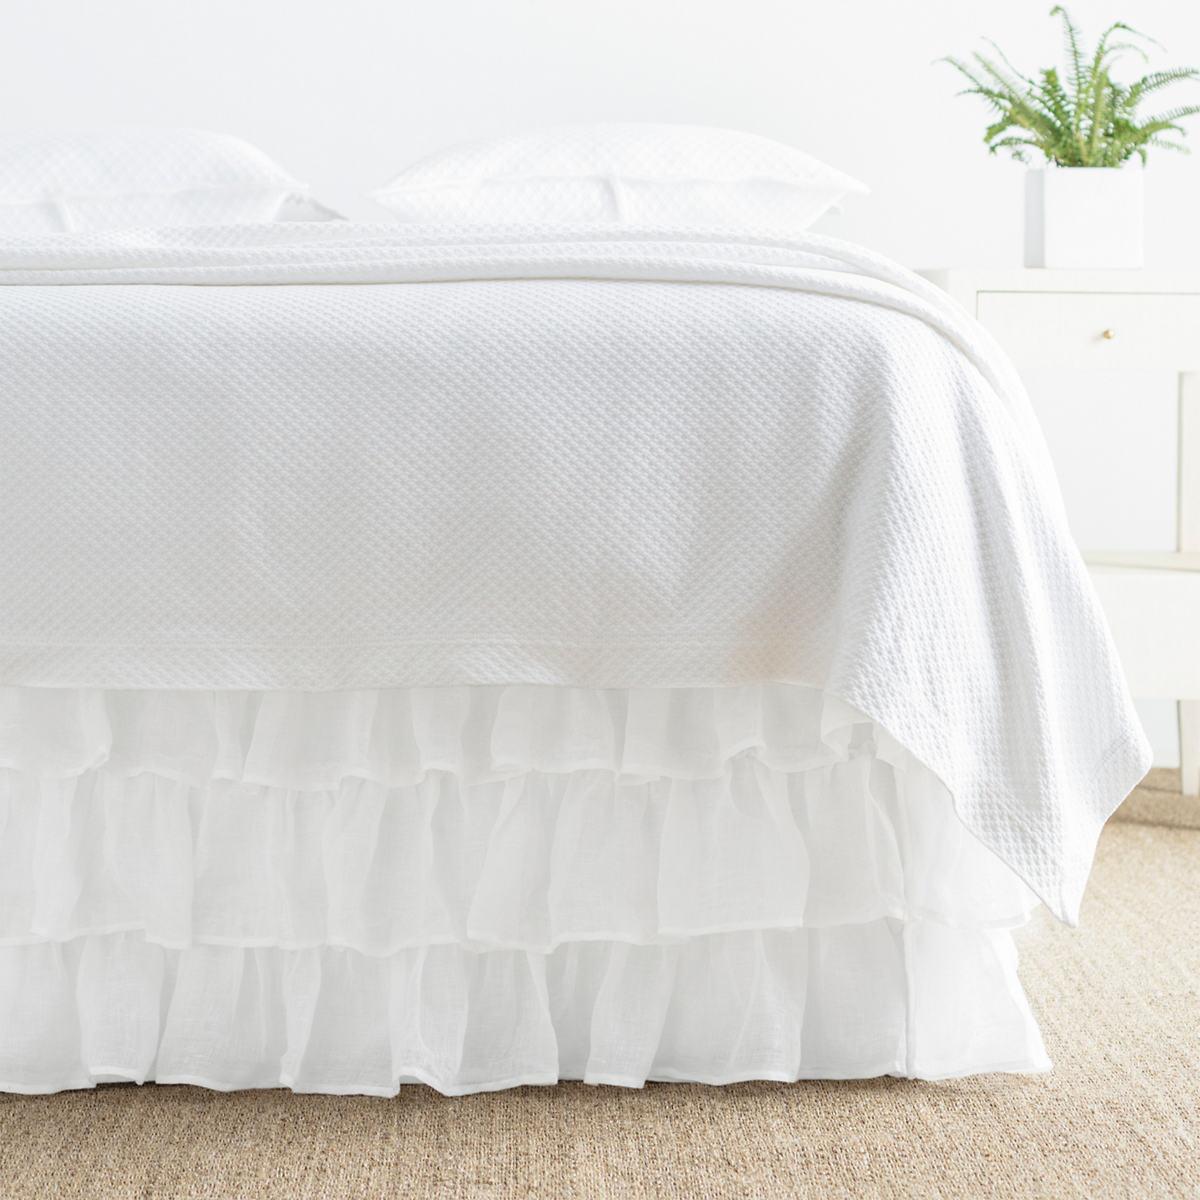 Savannah Linen Gauze White Tier Ruffle Bed Skirt